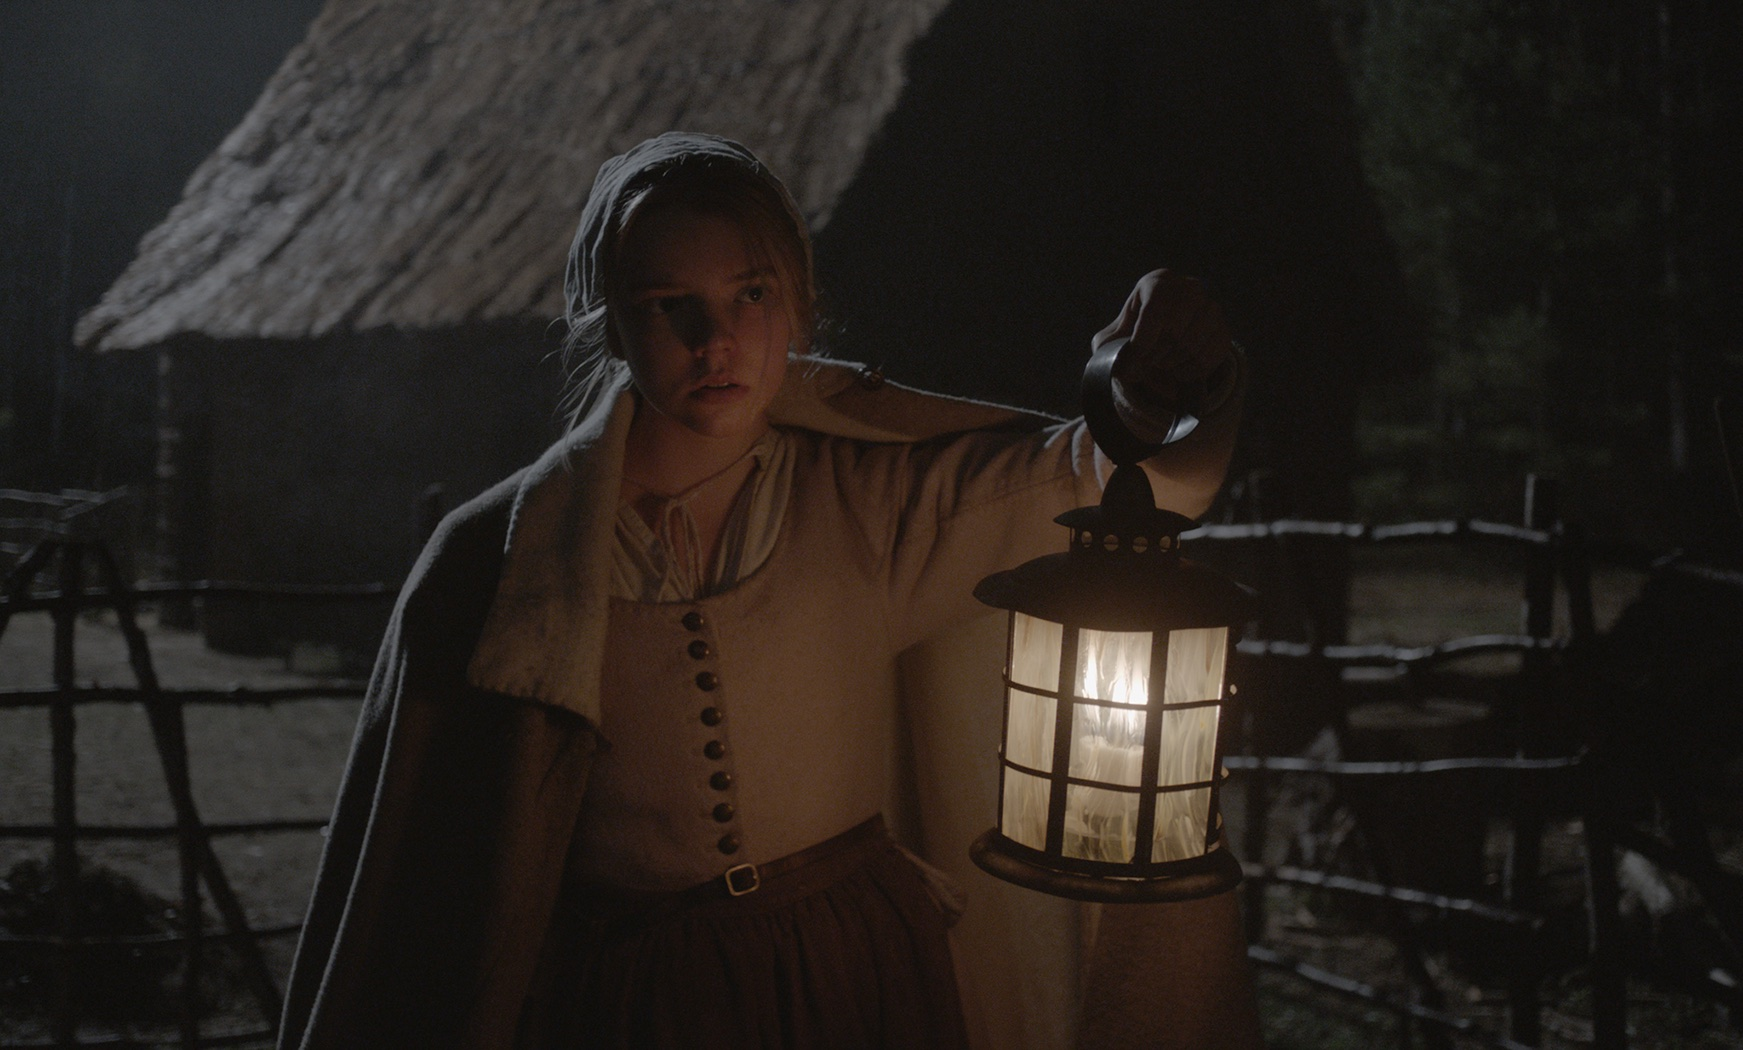 Thomasin, interpretada por  Anya Taylor-Joy